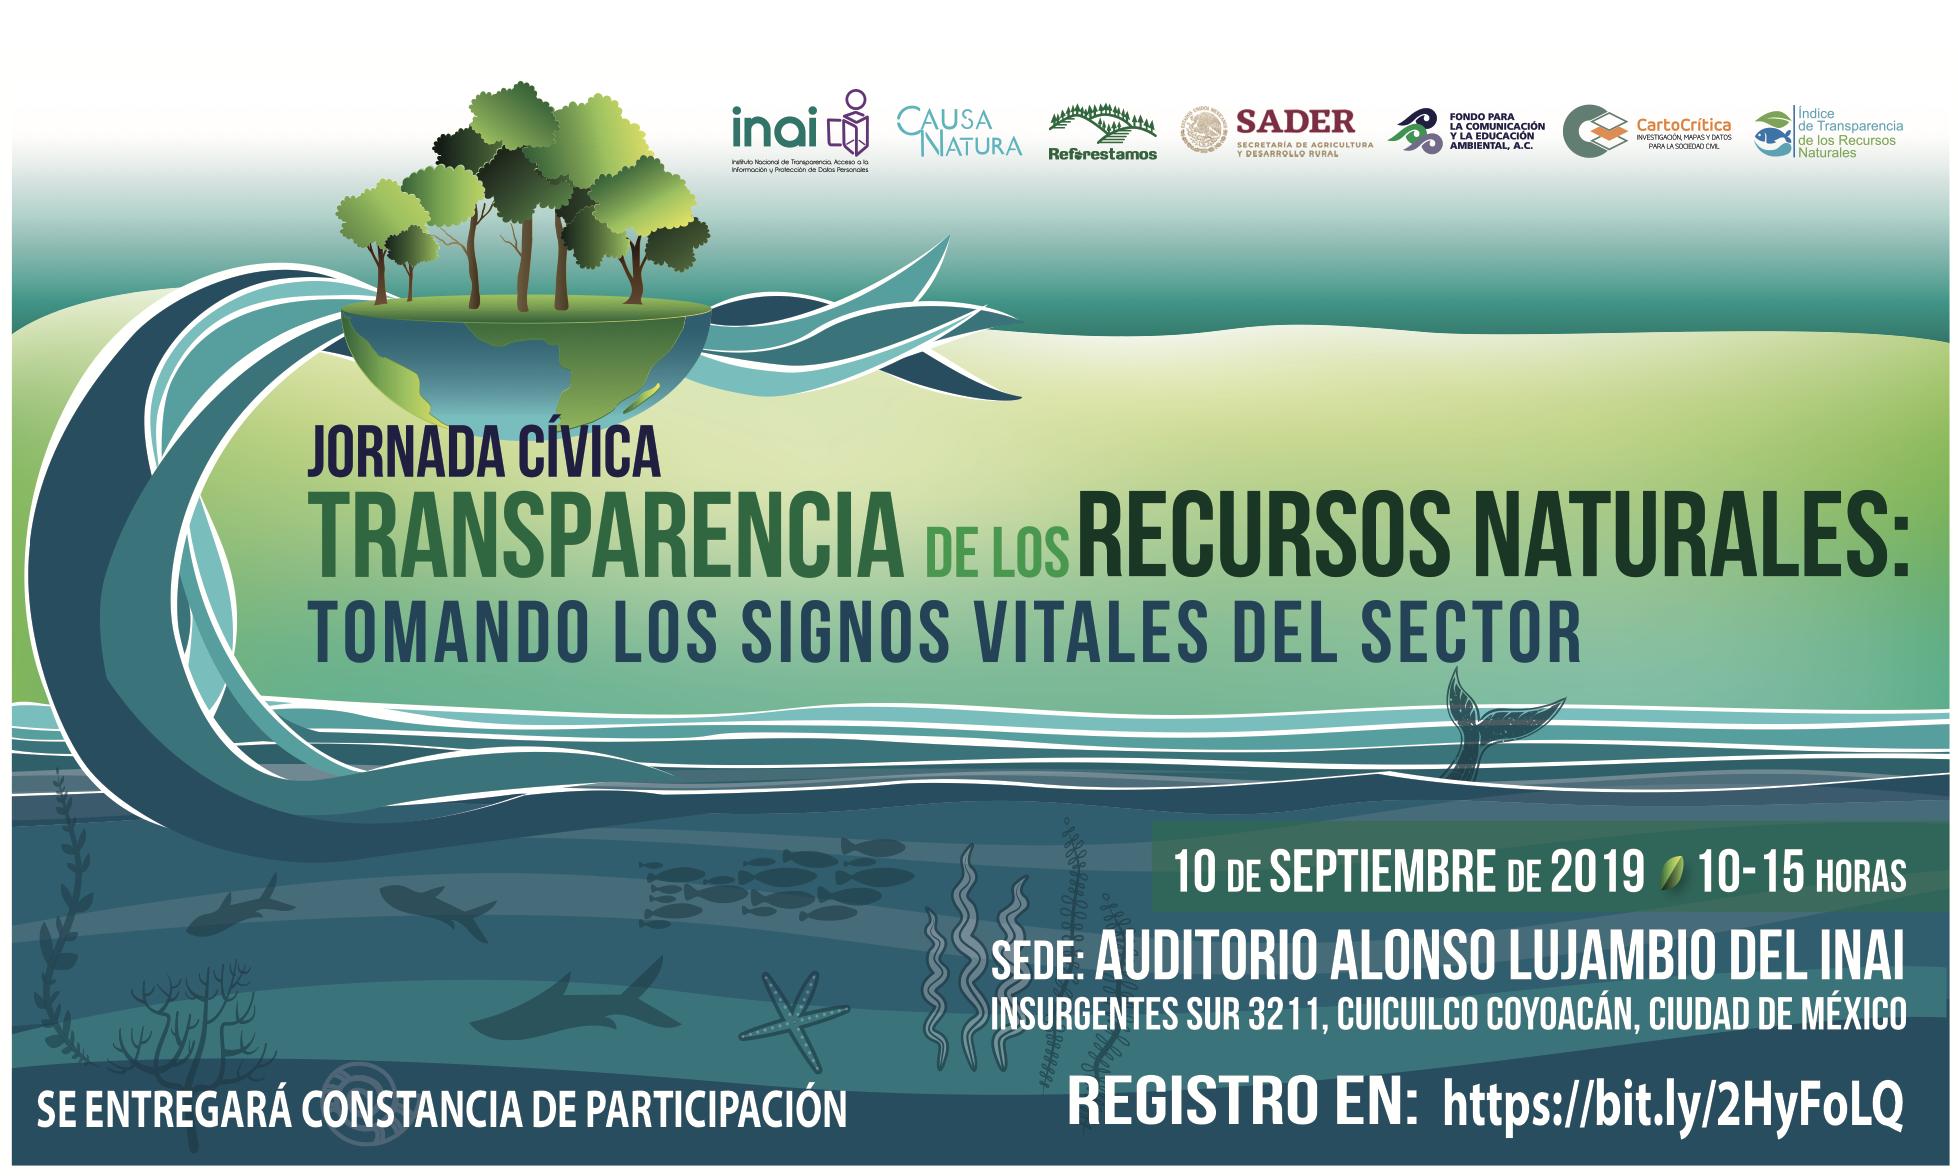 INAI :: Jornada Cívica, Transparencia de los Recursos Naturales